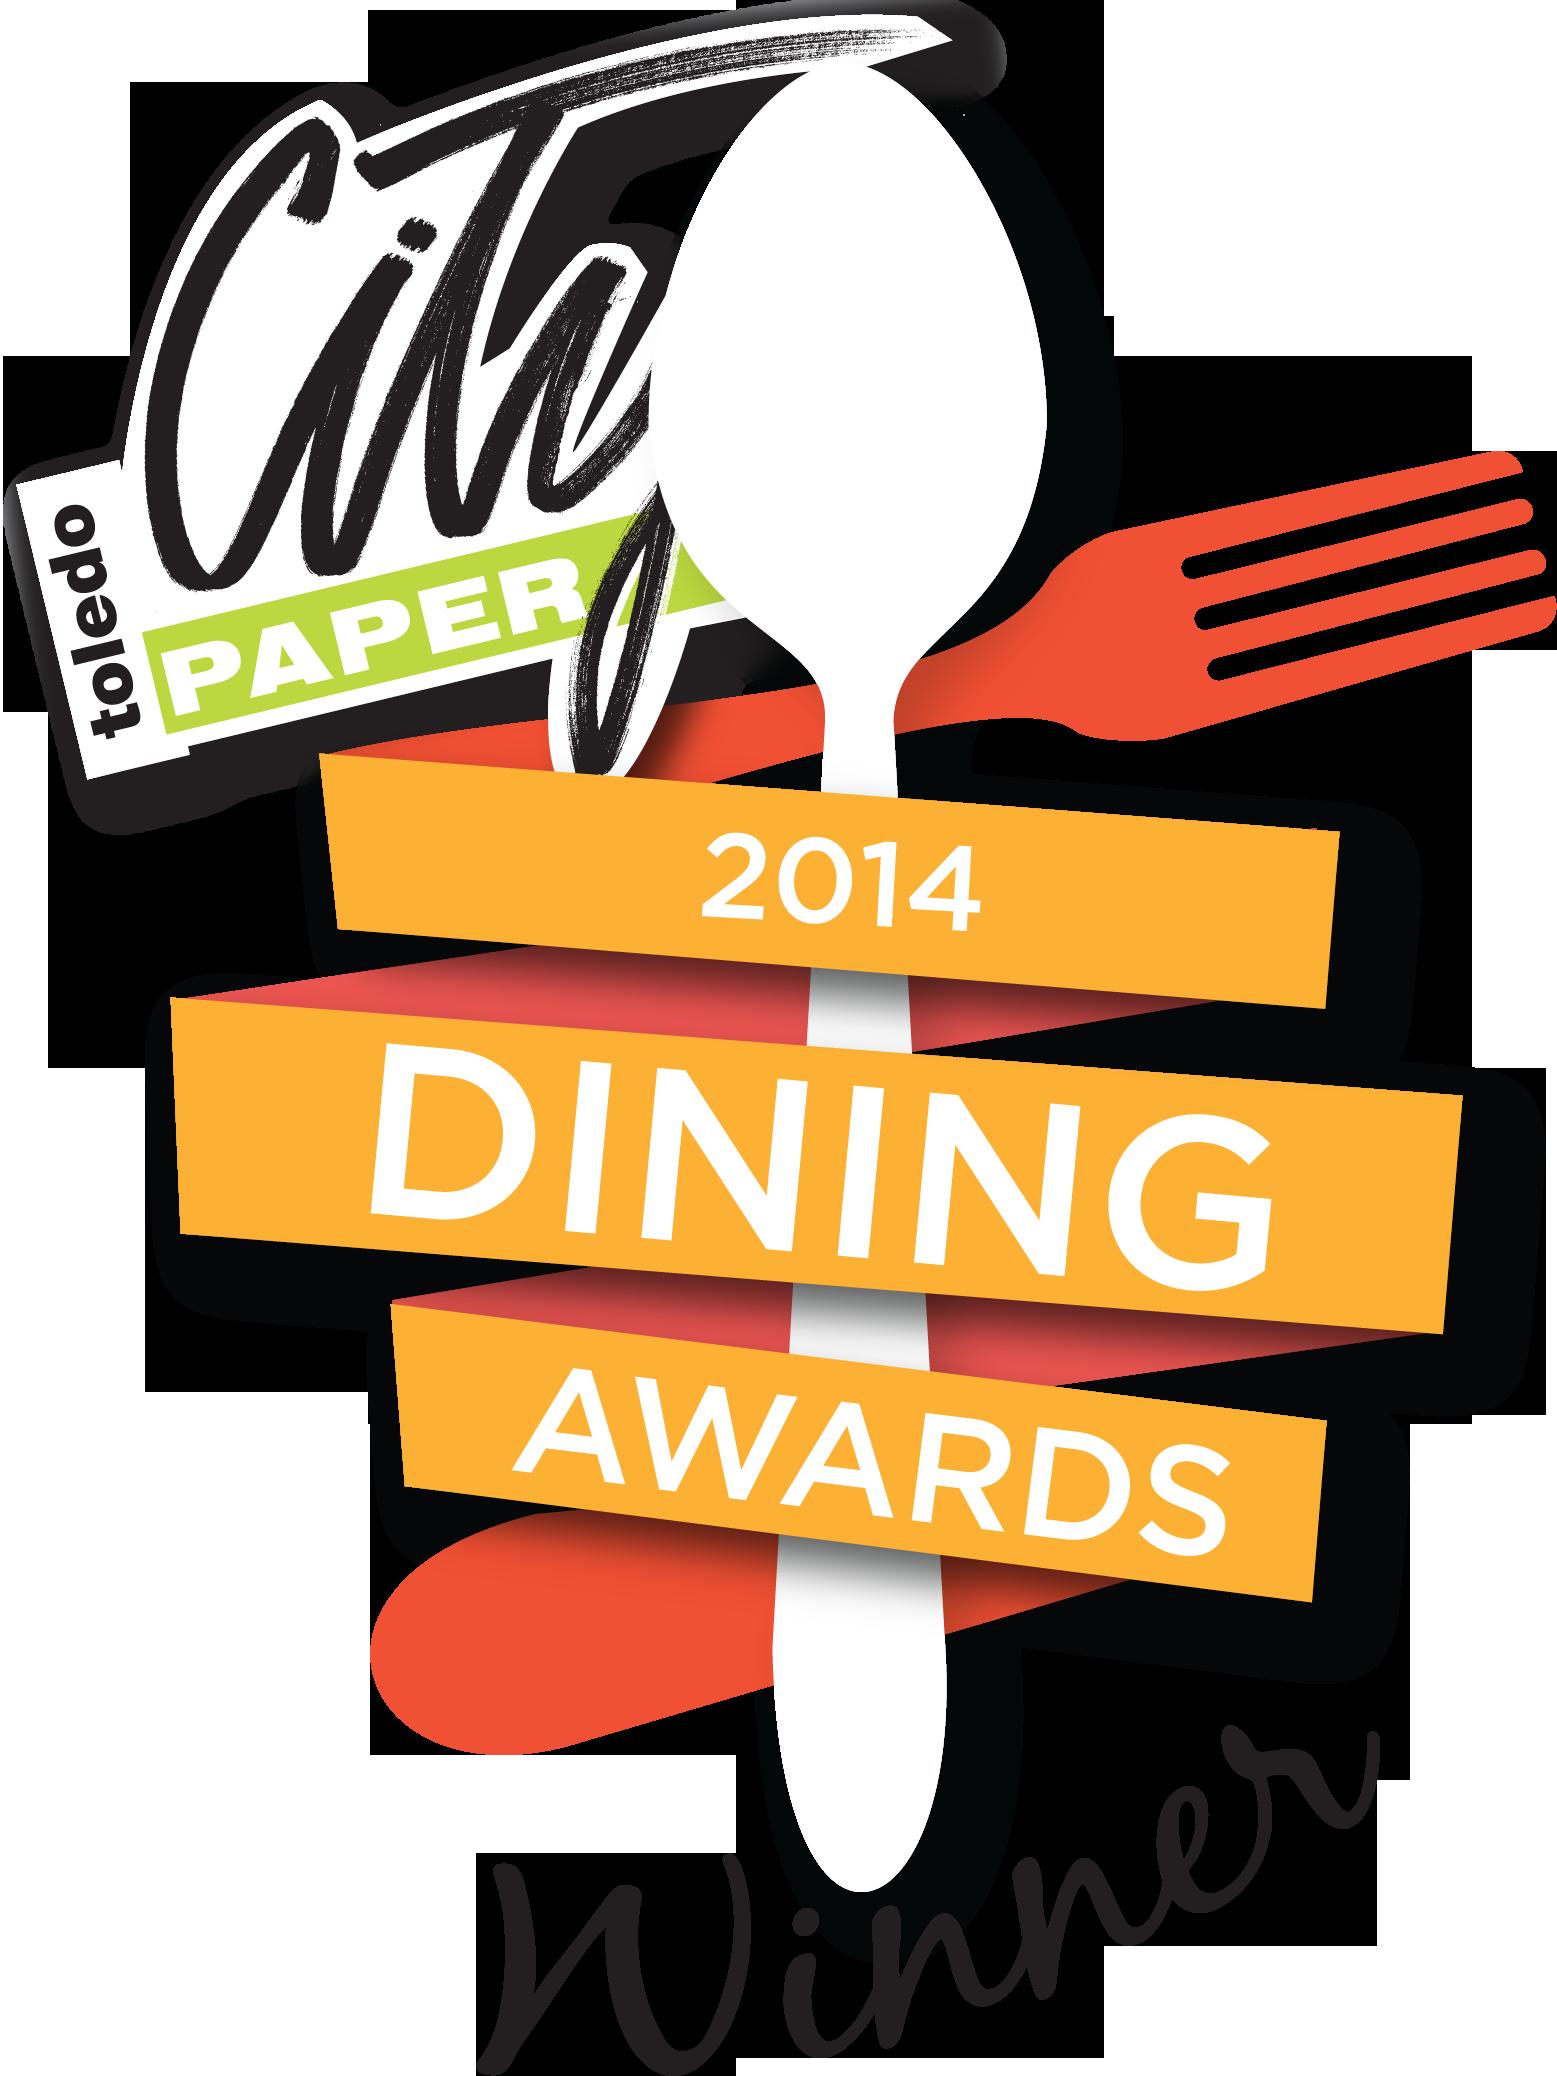 DiningGuide_Awards_4C_winner_final_2014